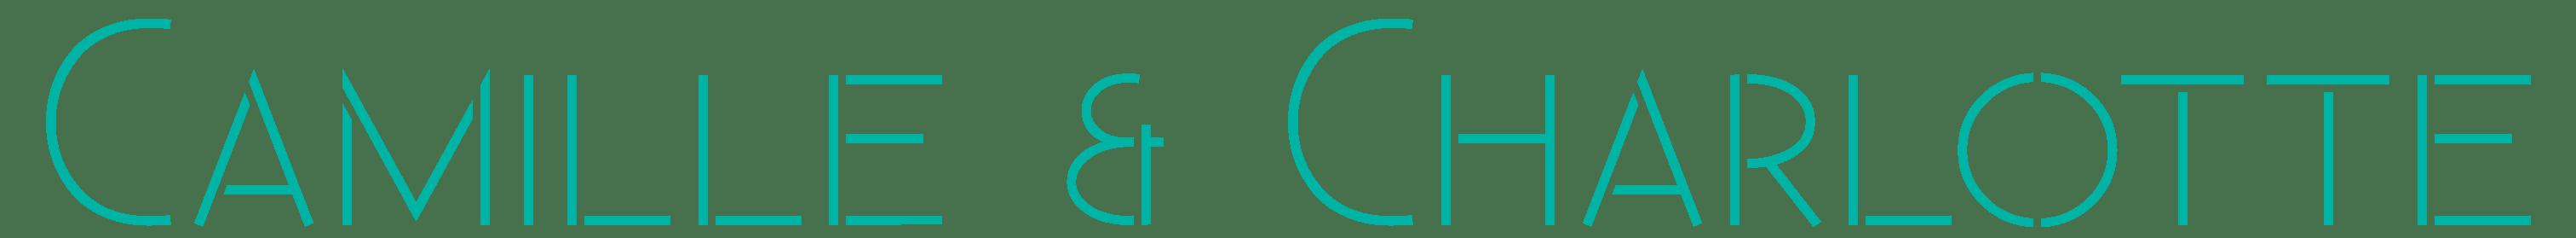 Logo camille & charlotte